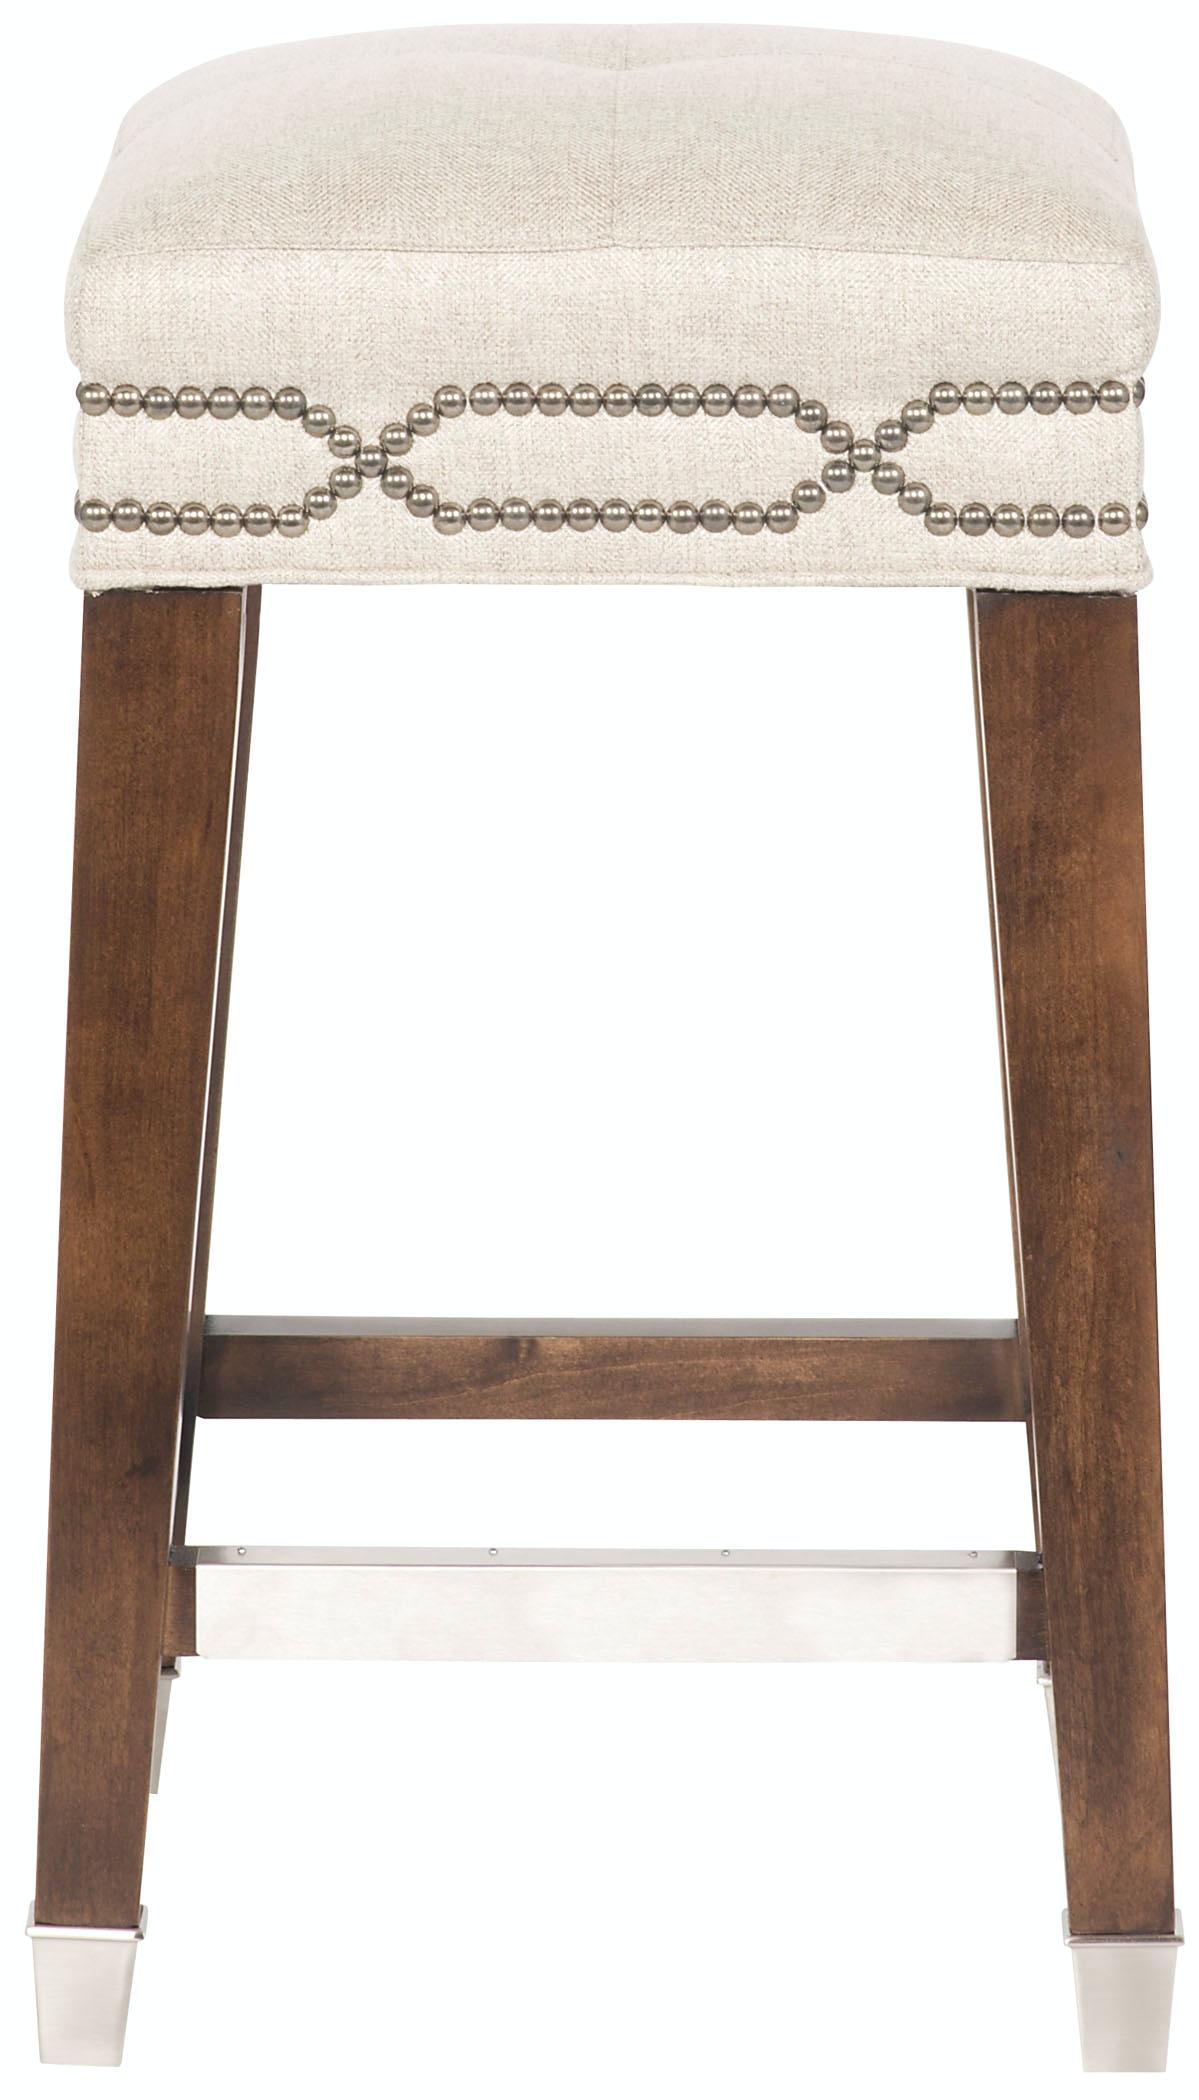 Vanguard Furniture Marley Counter Stool V964 CS